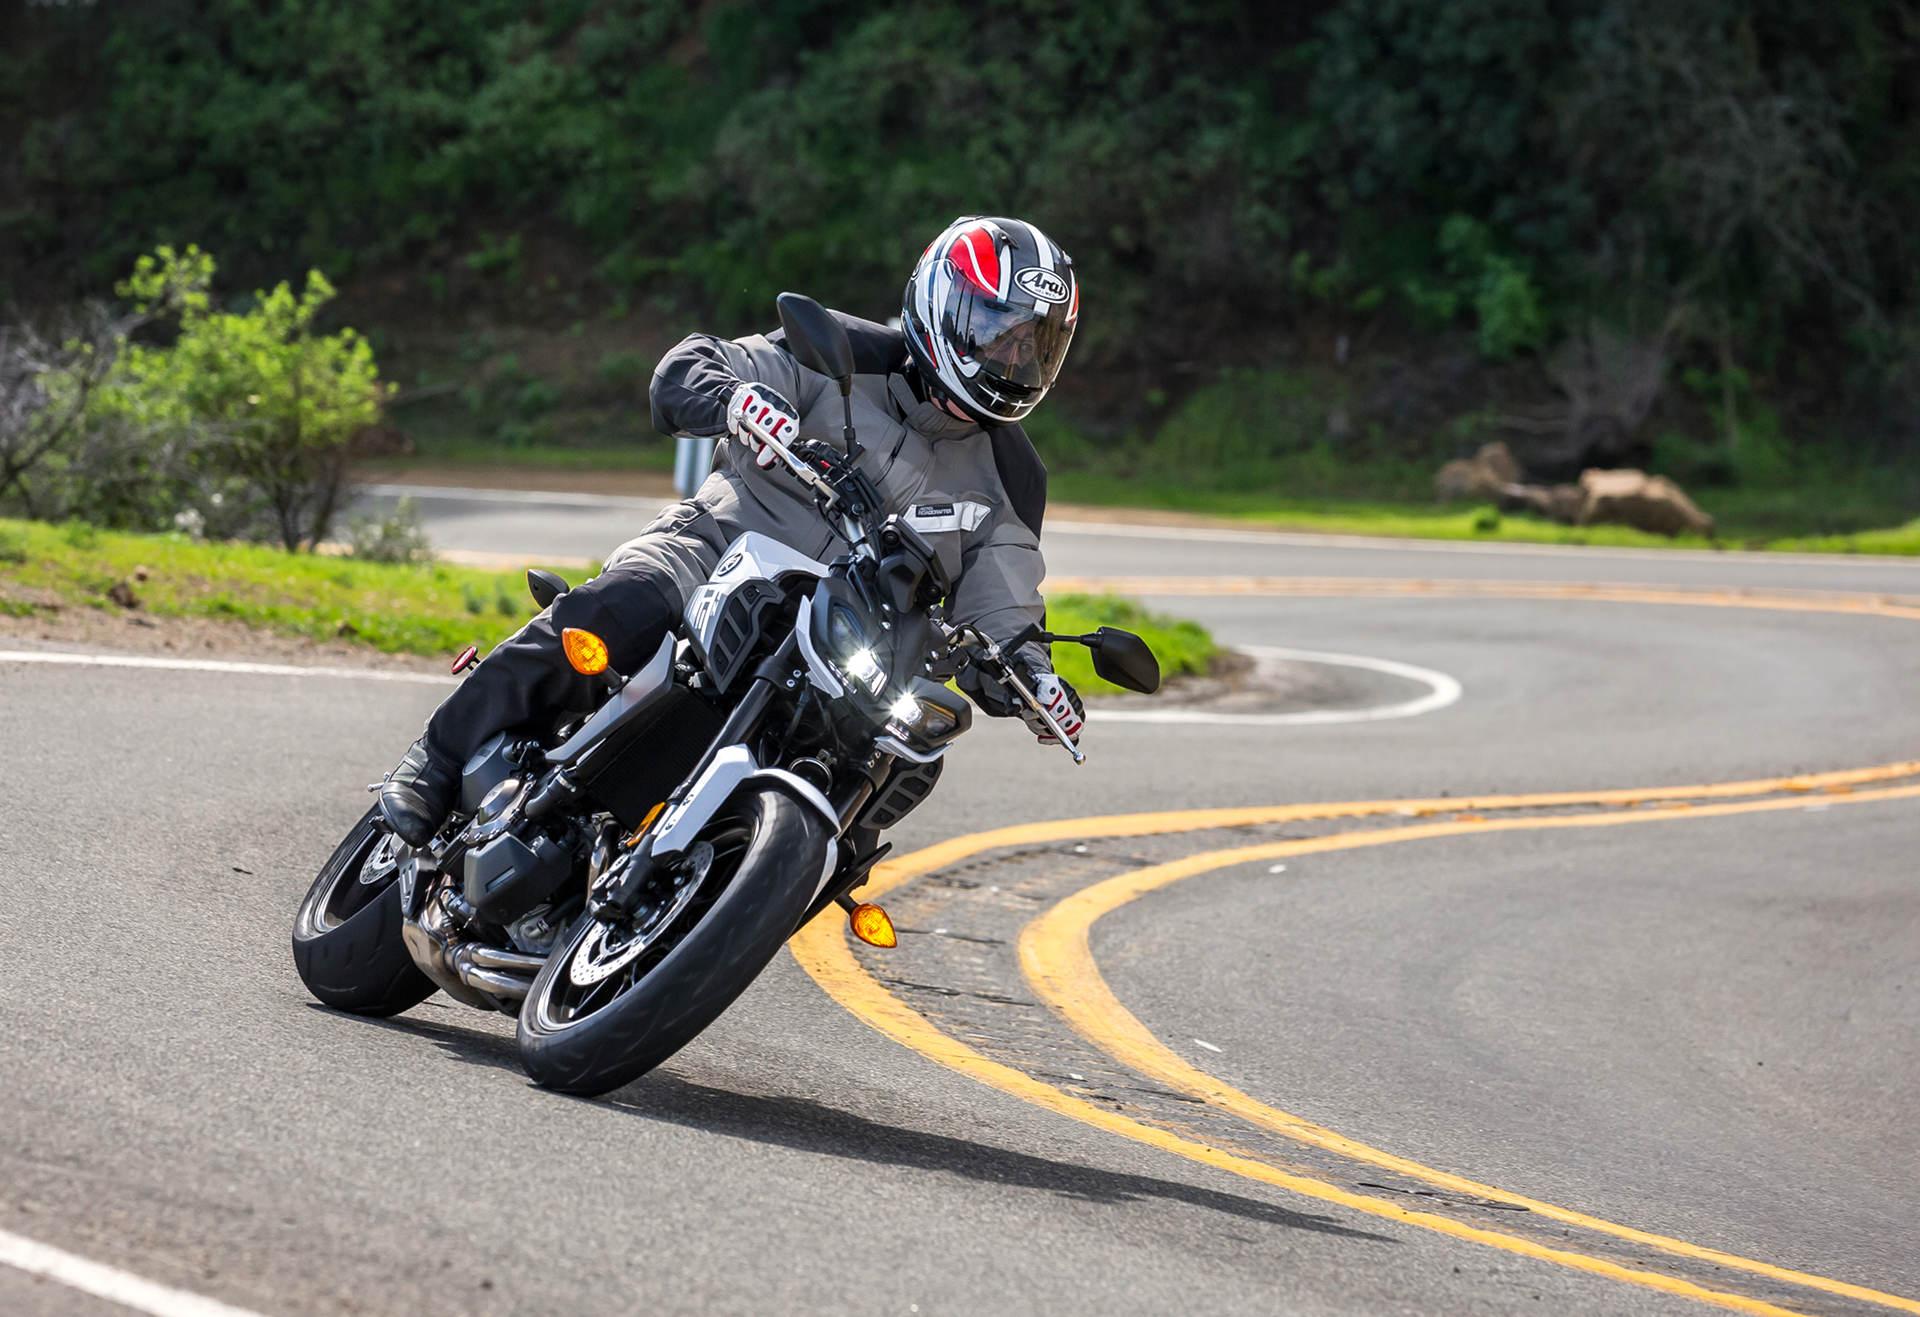 2017 Yamaha FZ-09: MD First Ride - MotorcycleDaily com